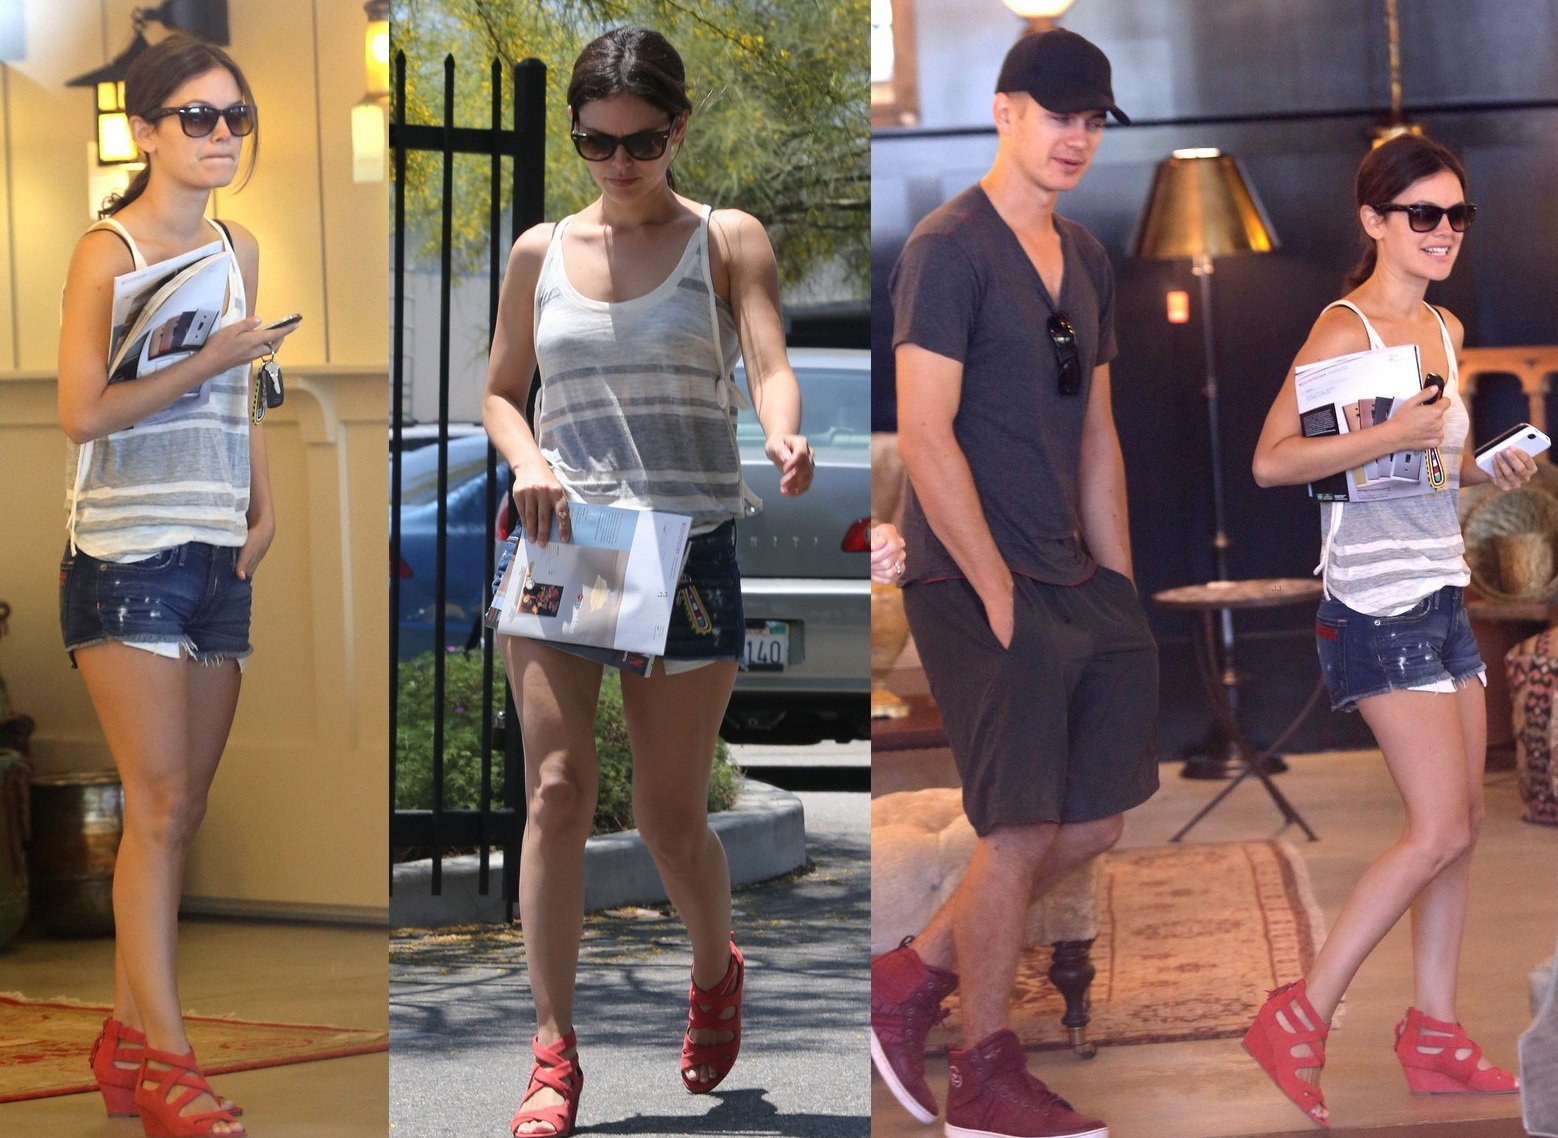 http://4.bp.blogspot.com/-ZQb9-6Vuouw/UATs0WyoTeI/AAAAAAAAGbs/NVrmniTqJYc/s1600/Rachel+Bilson+ShoeMint+Red+Sandals.jpg